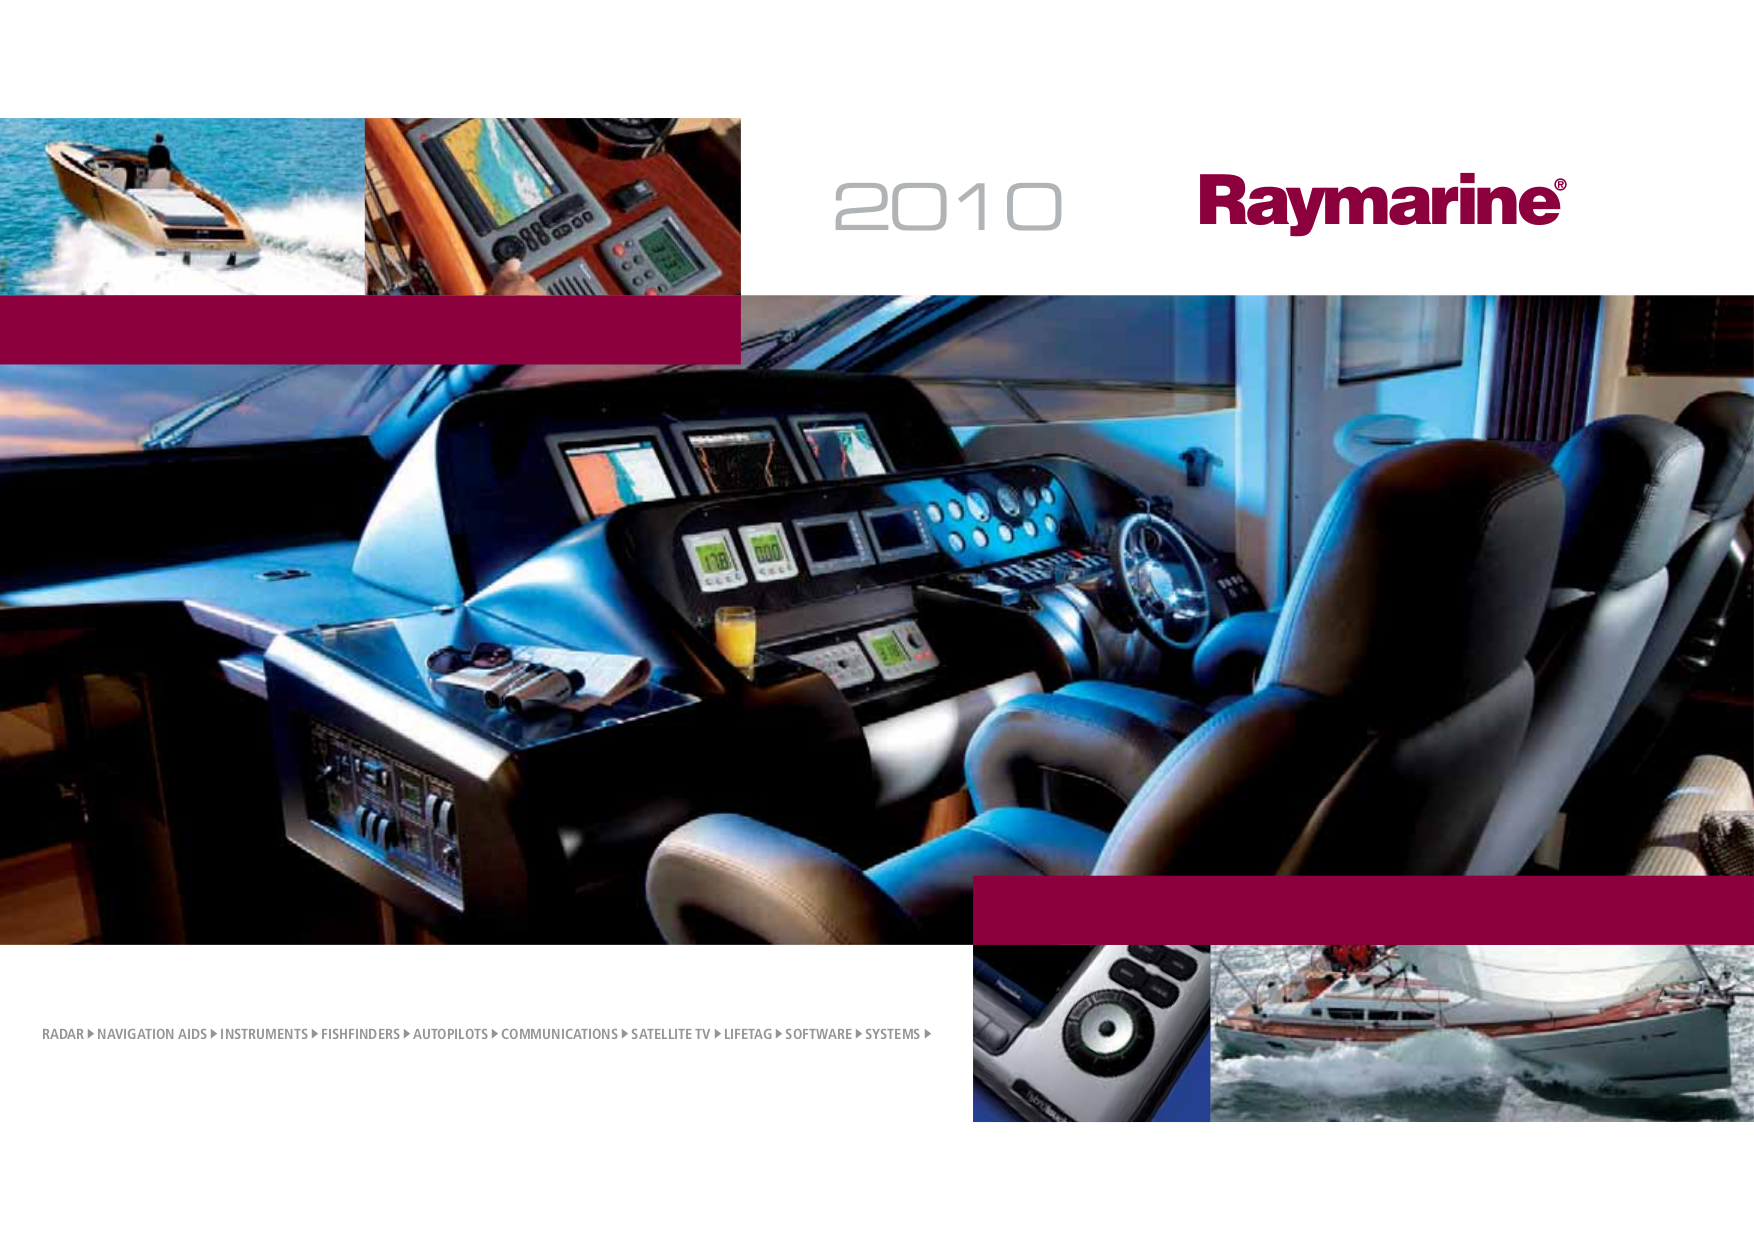 Download free pdf for Raymarine C120 GPS manual